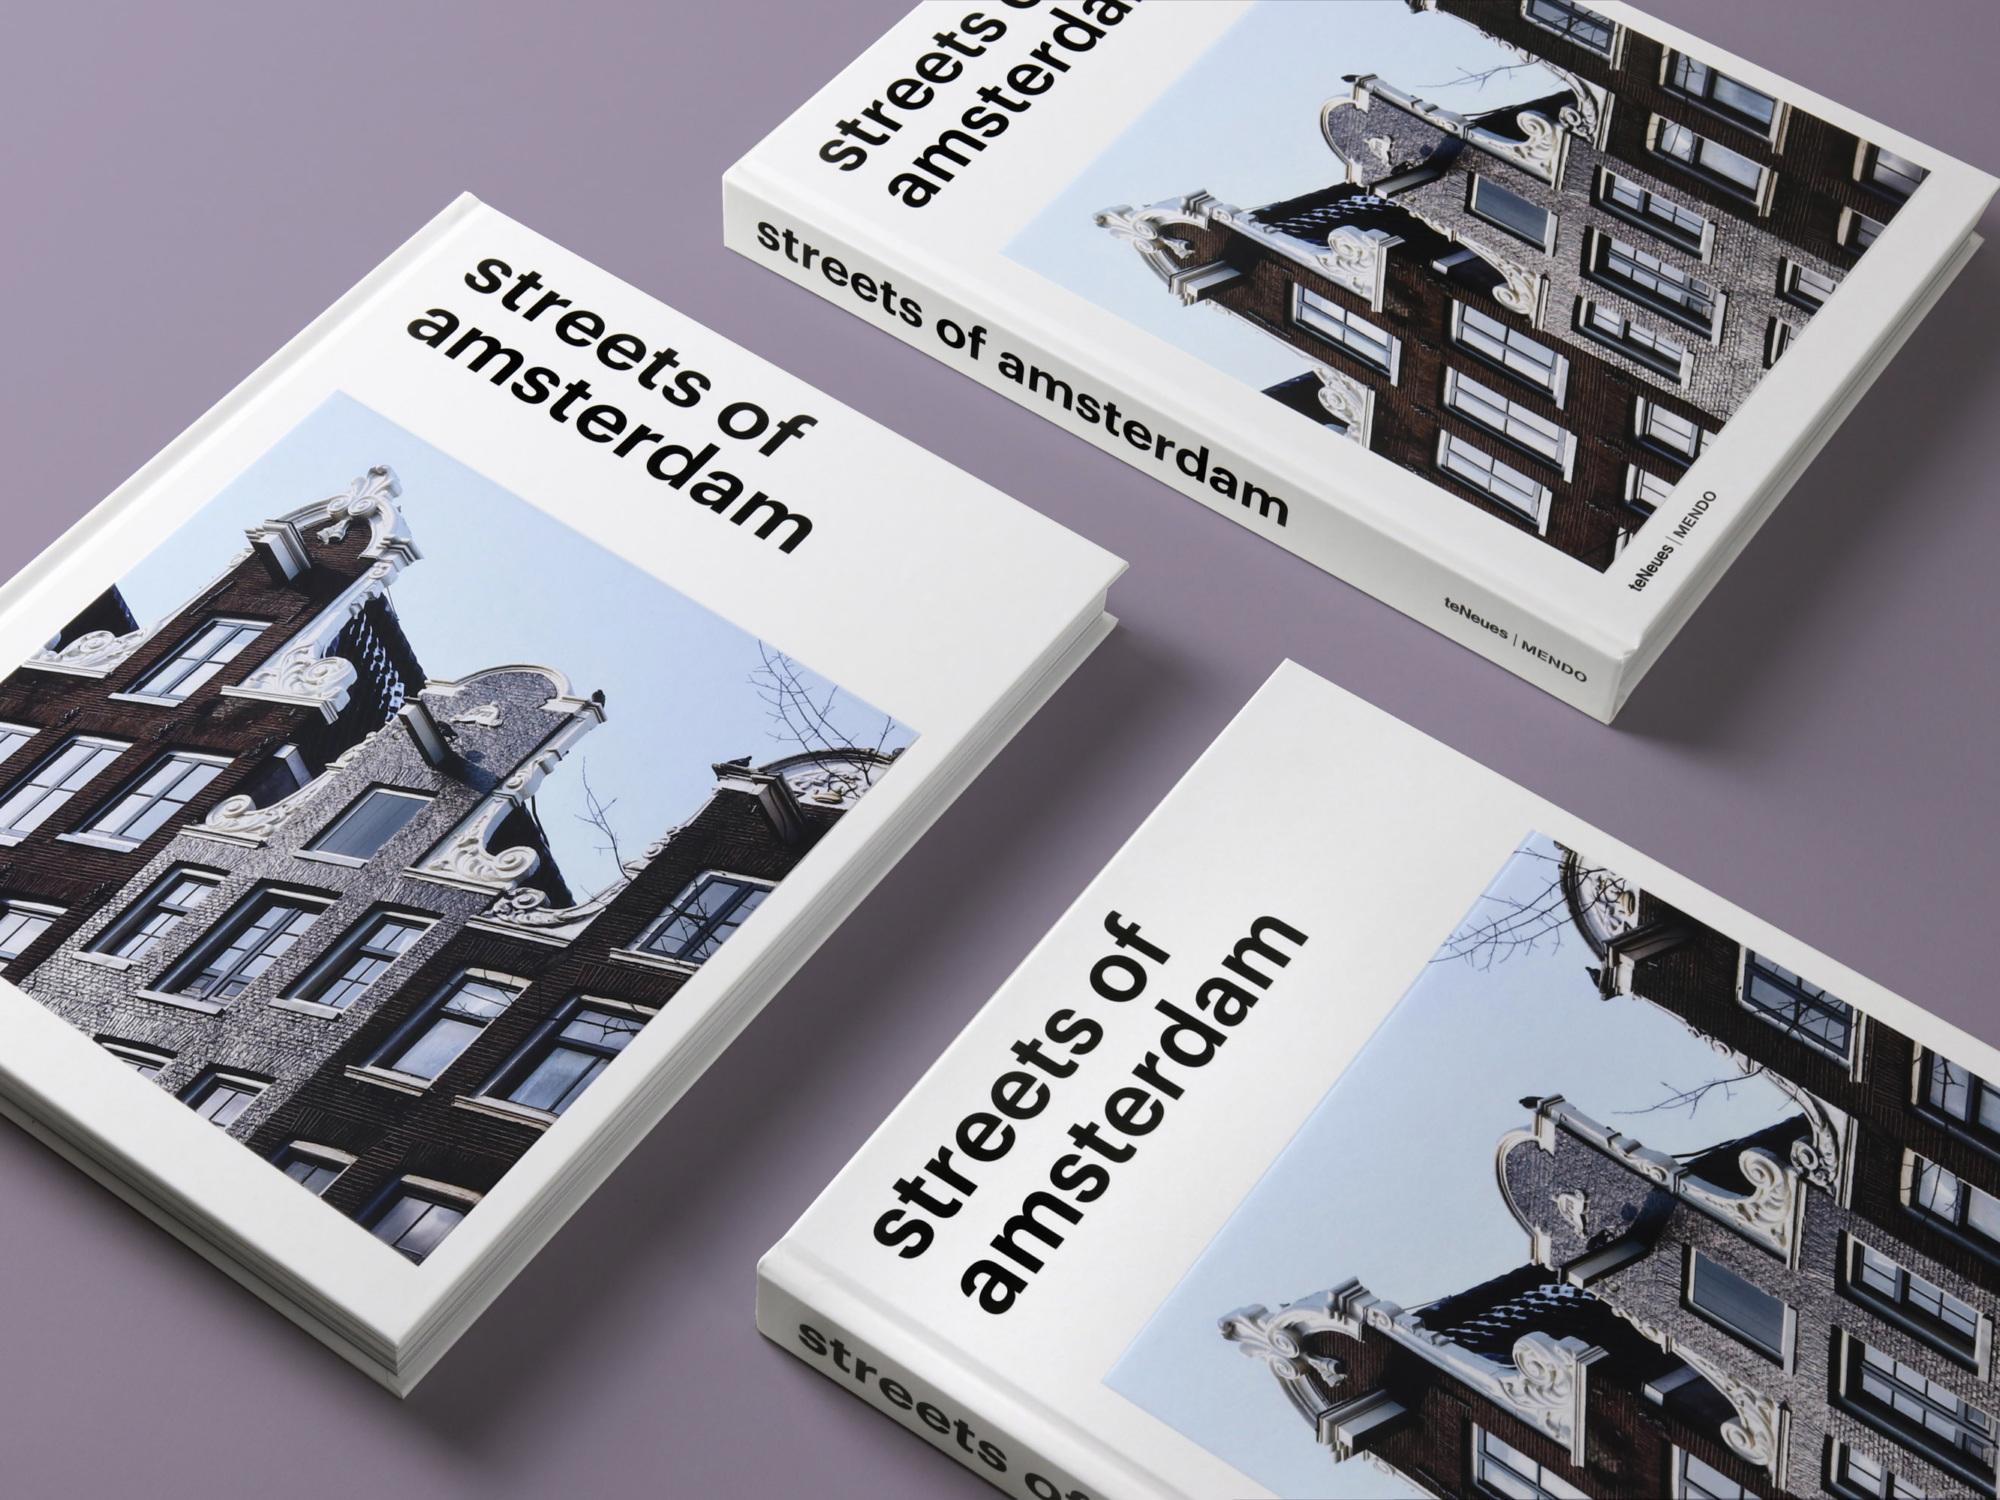 mendo-book-streets-of-amsterdam-studio-23-2000x1500-c-default.jpg